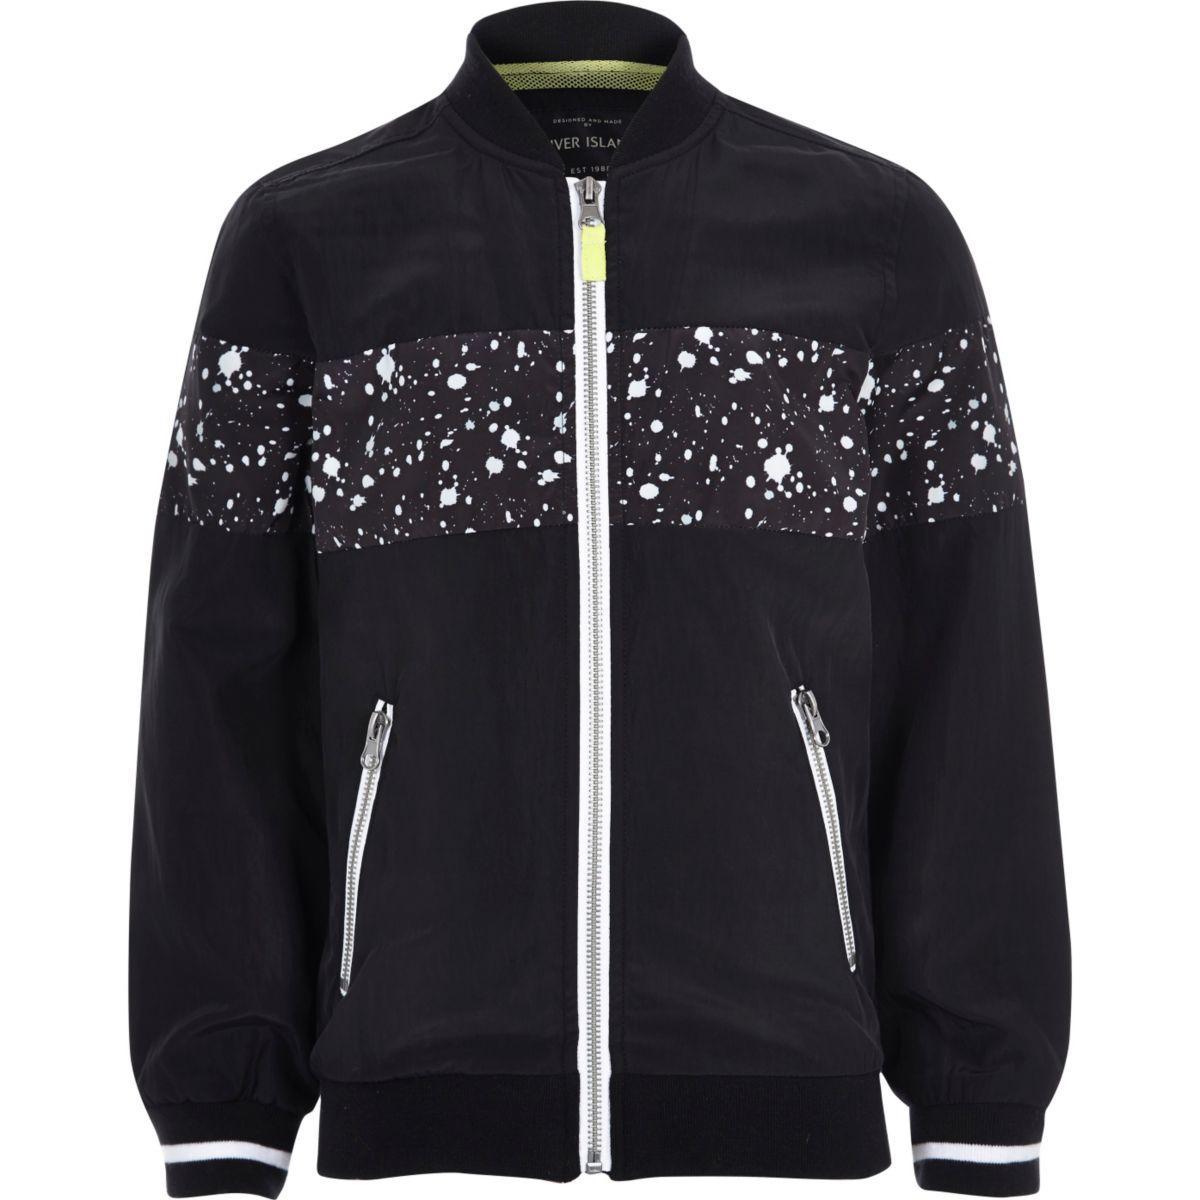 Boys black paint splatter bomber jacket